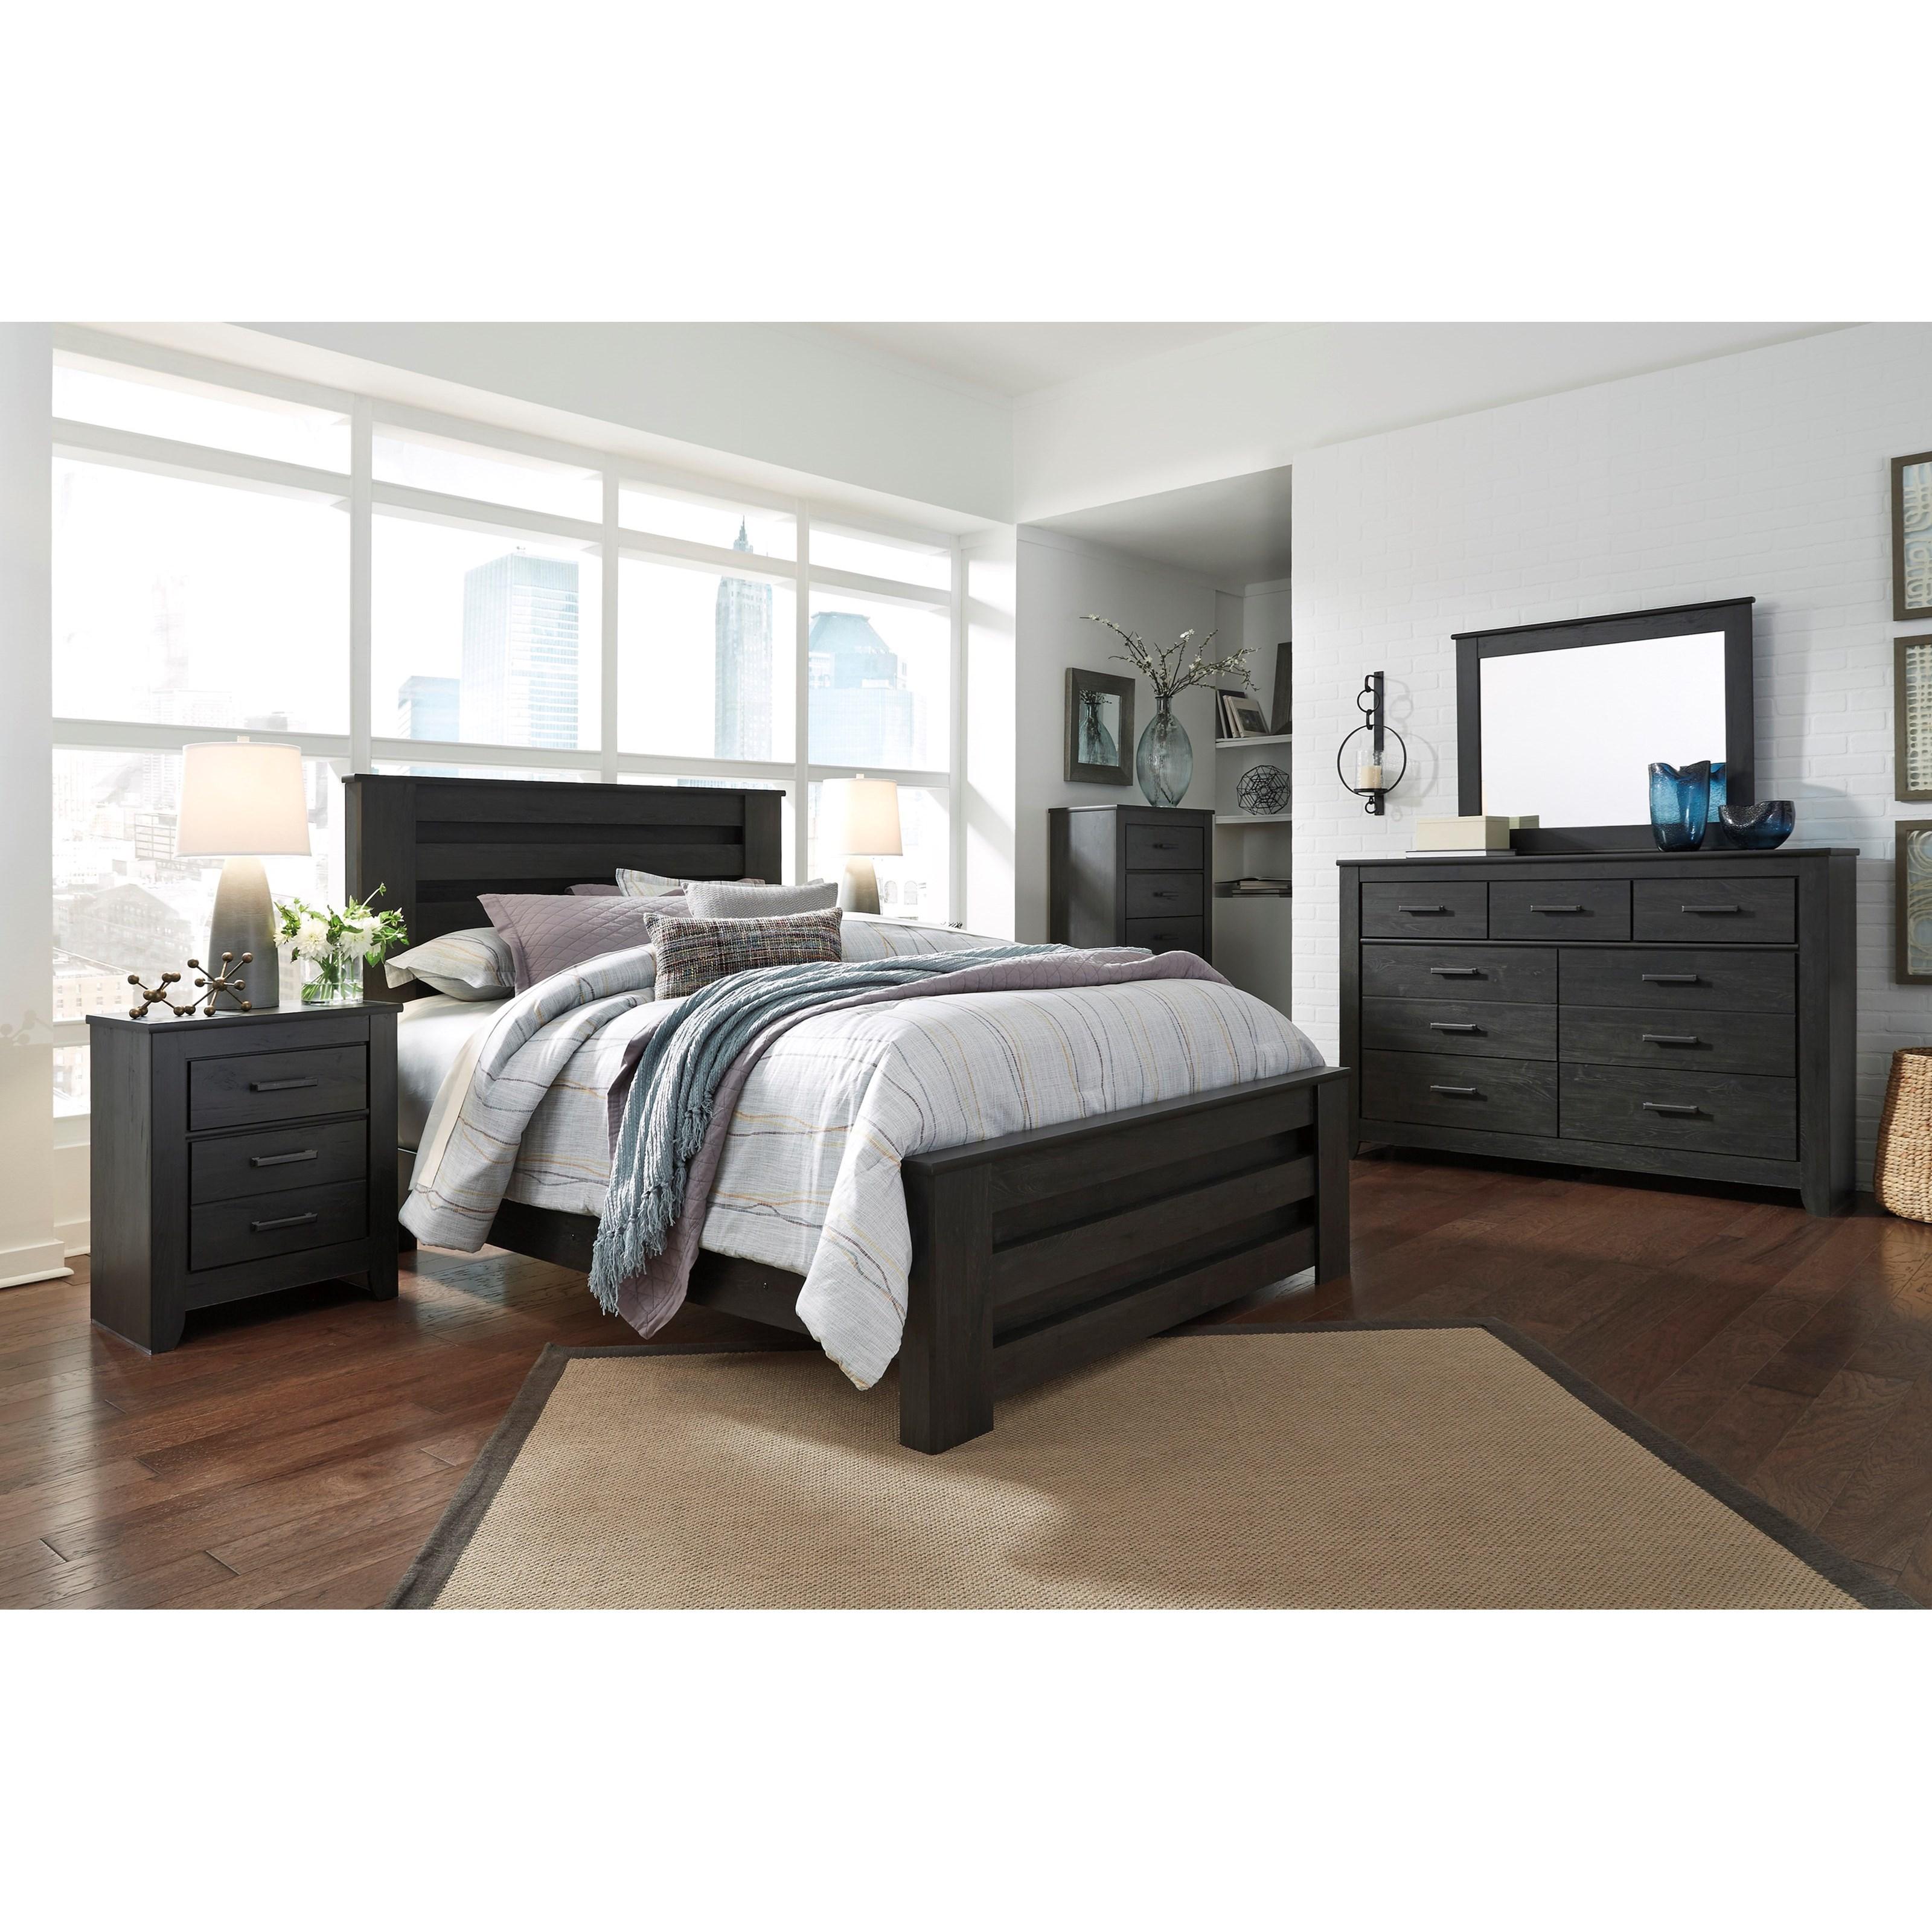 Levitz Furniture Stores: Signature Design By Ashley Brinxton Queen Bedroom Group